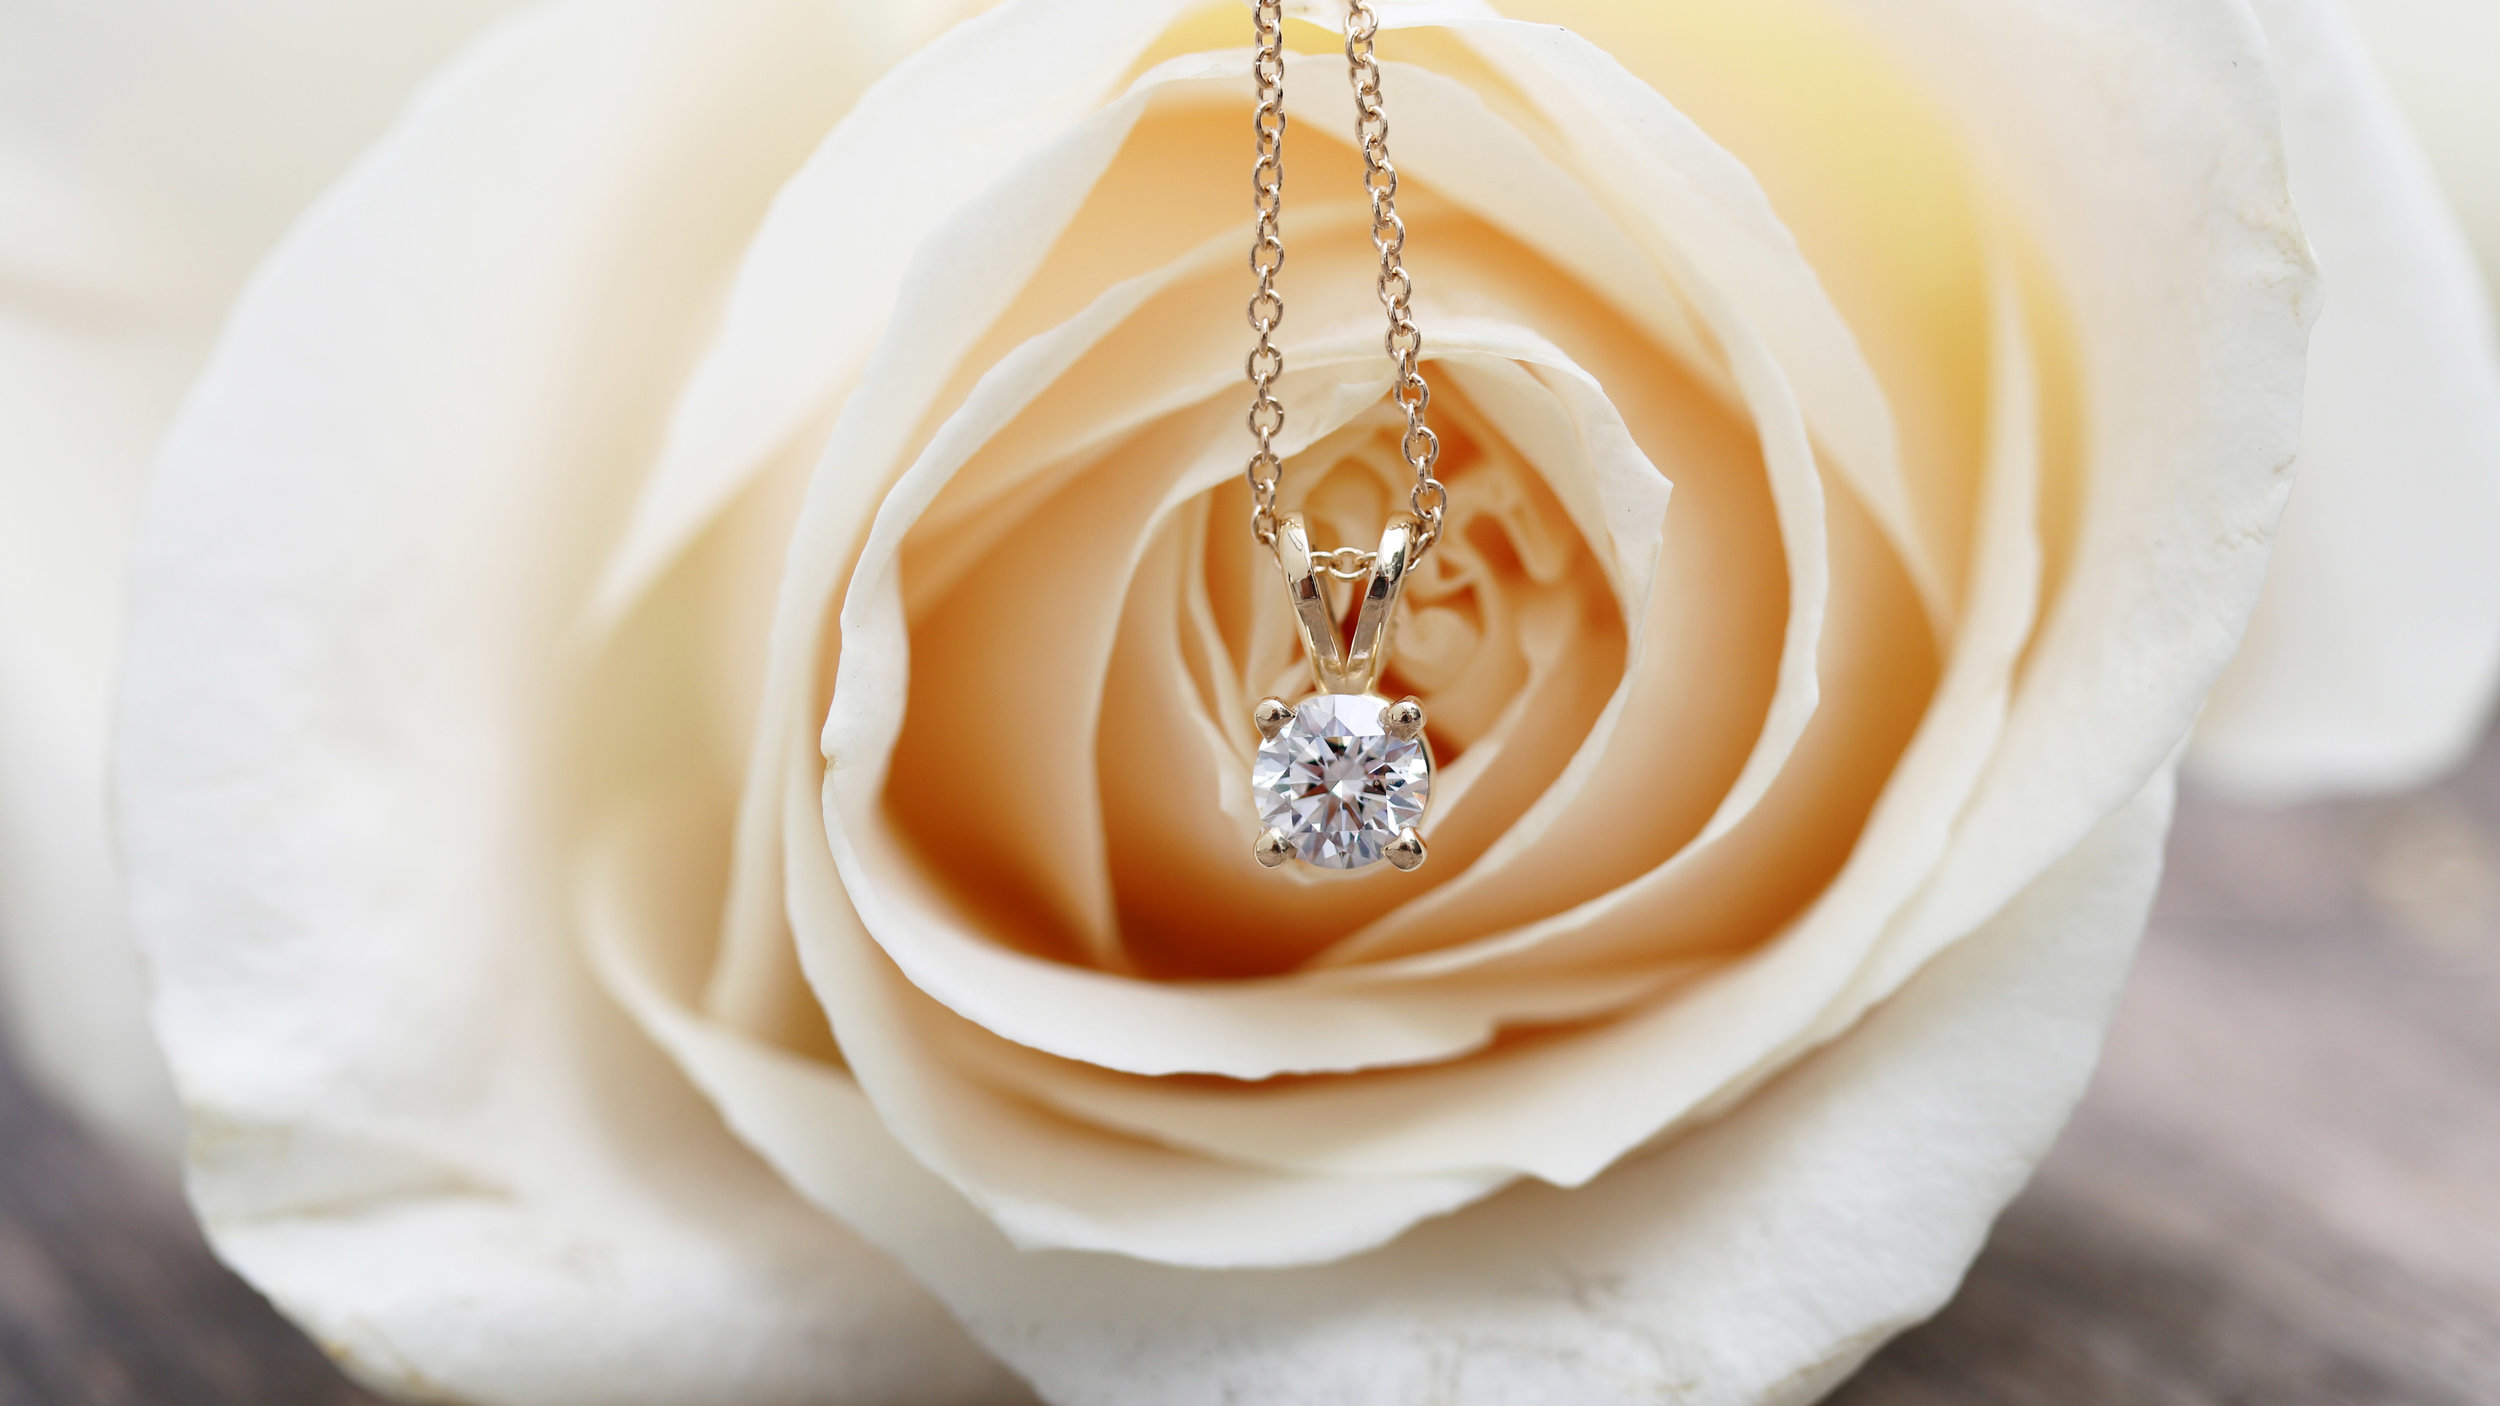 inner karma lab diamond necklace AD-036